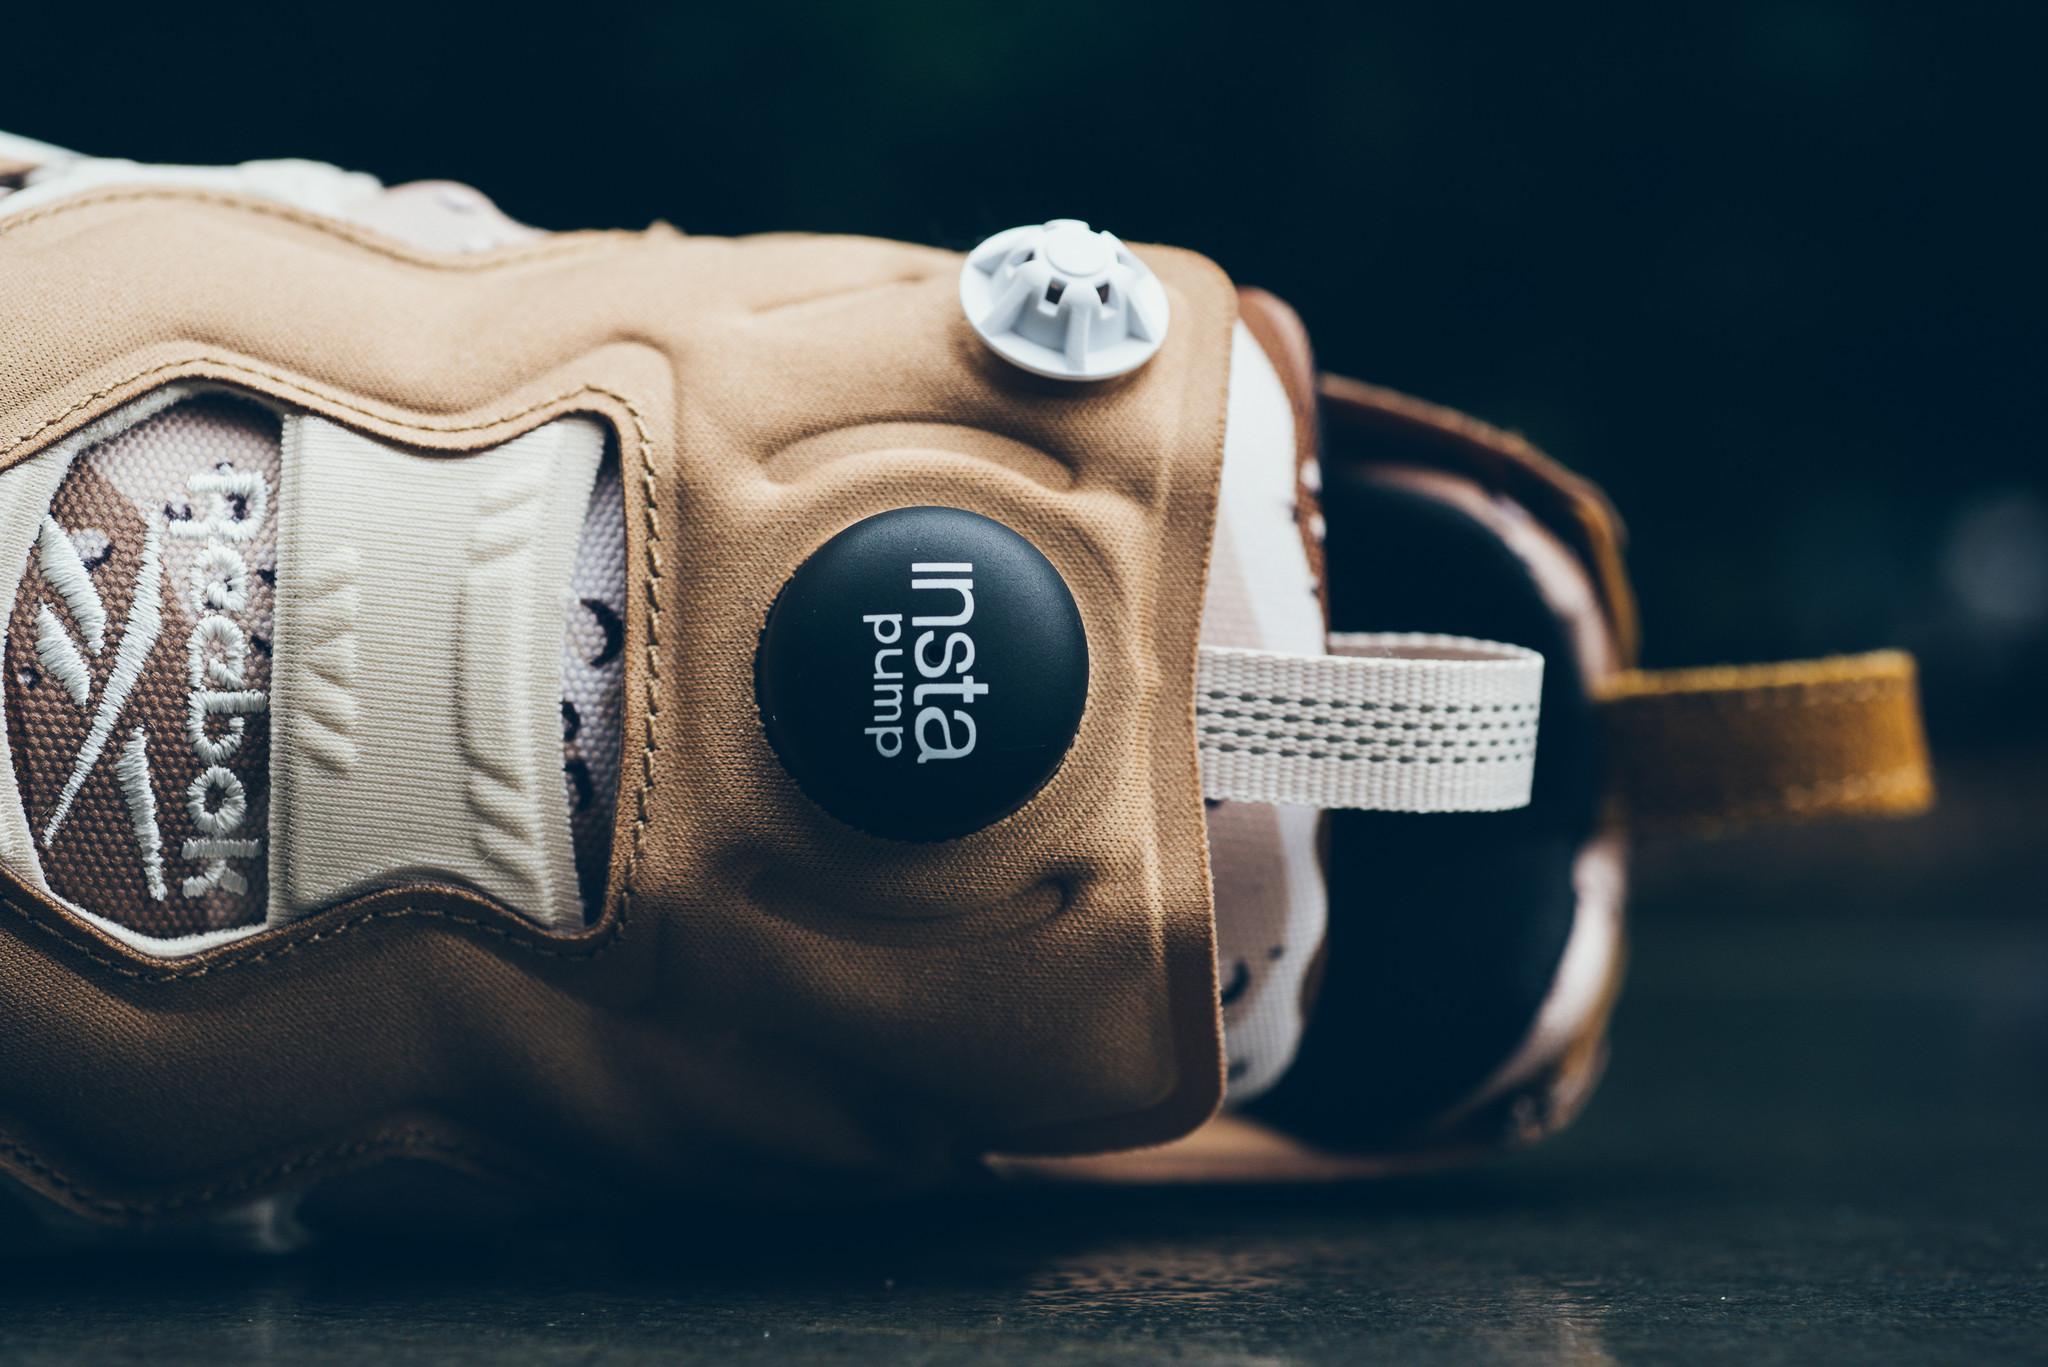 Instapump_Fury_OG_Camo_Sneaker_POlitics_Hypebeast_16